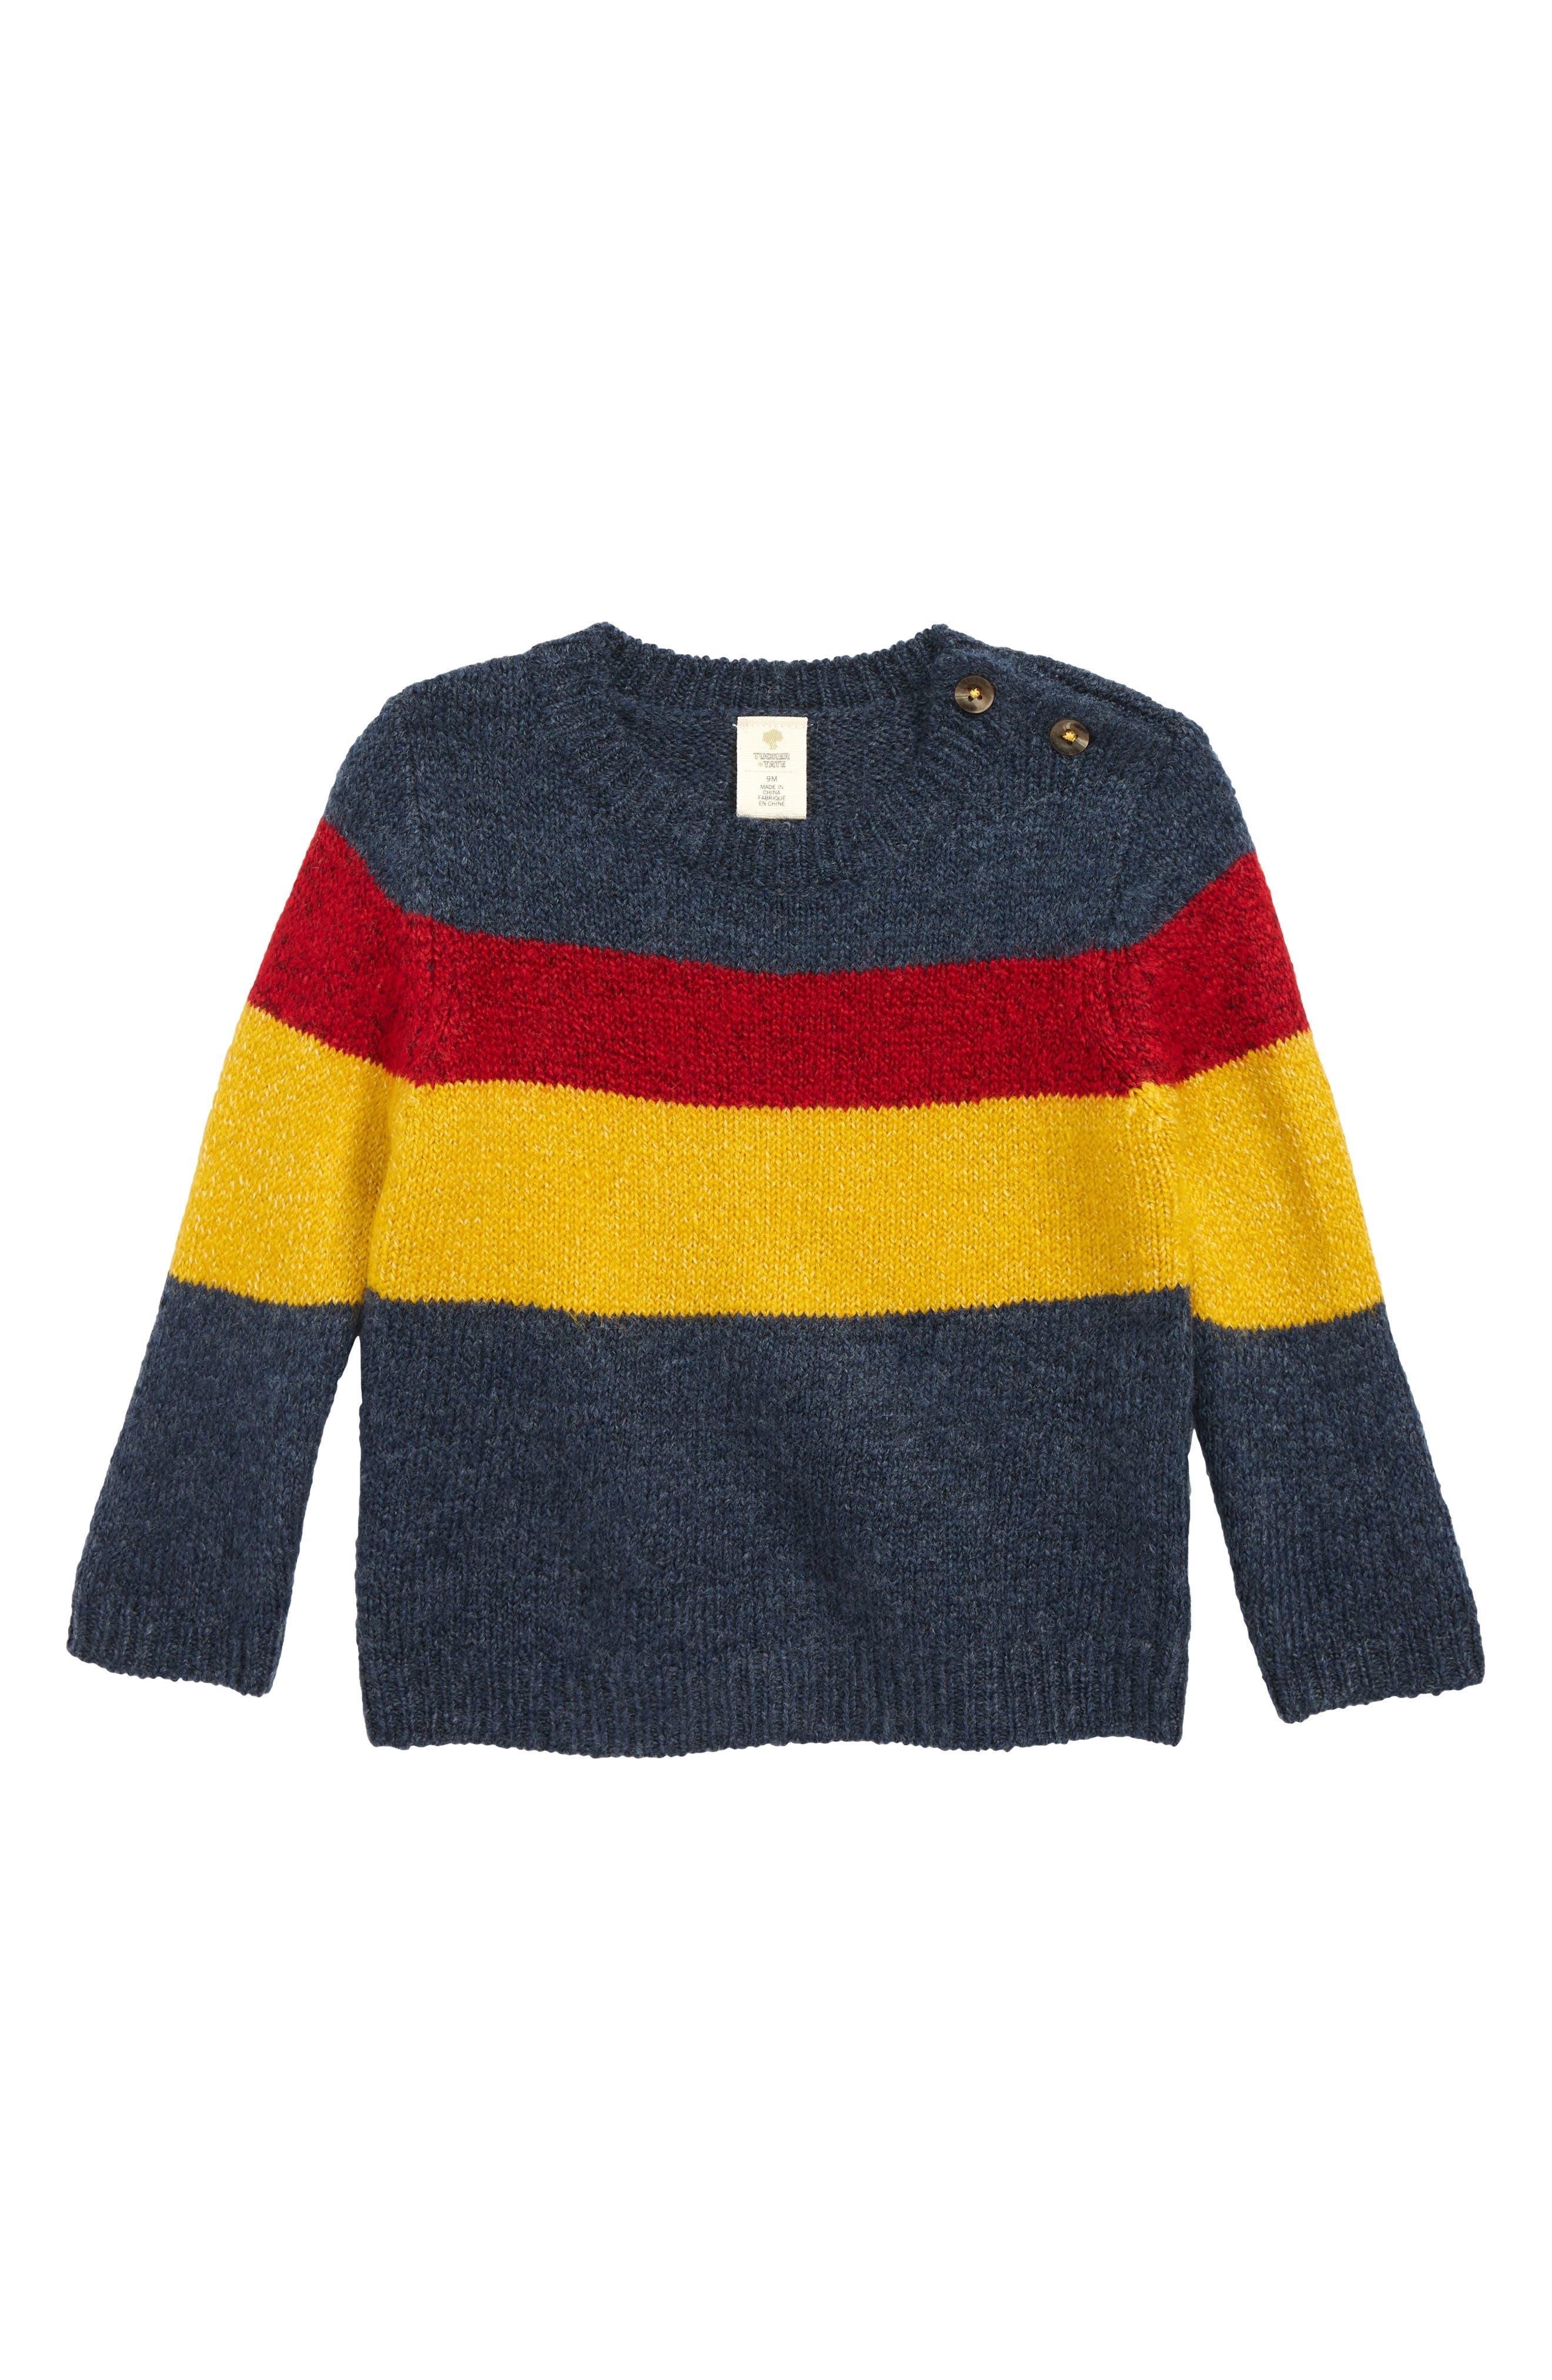 Bold Stripe Sweater,                             Main thumbnail 1, color,                             NAVY DENIM MULTI STRIPE